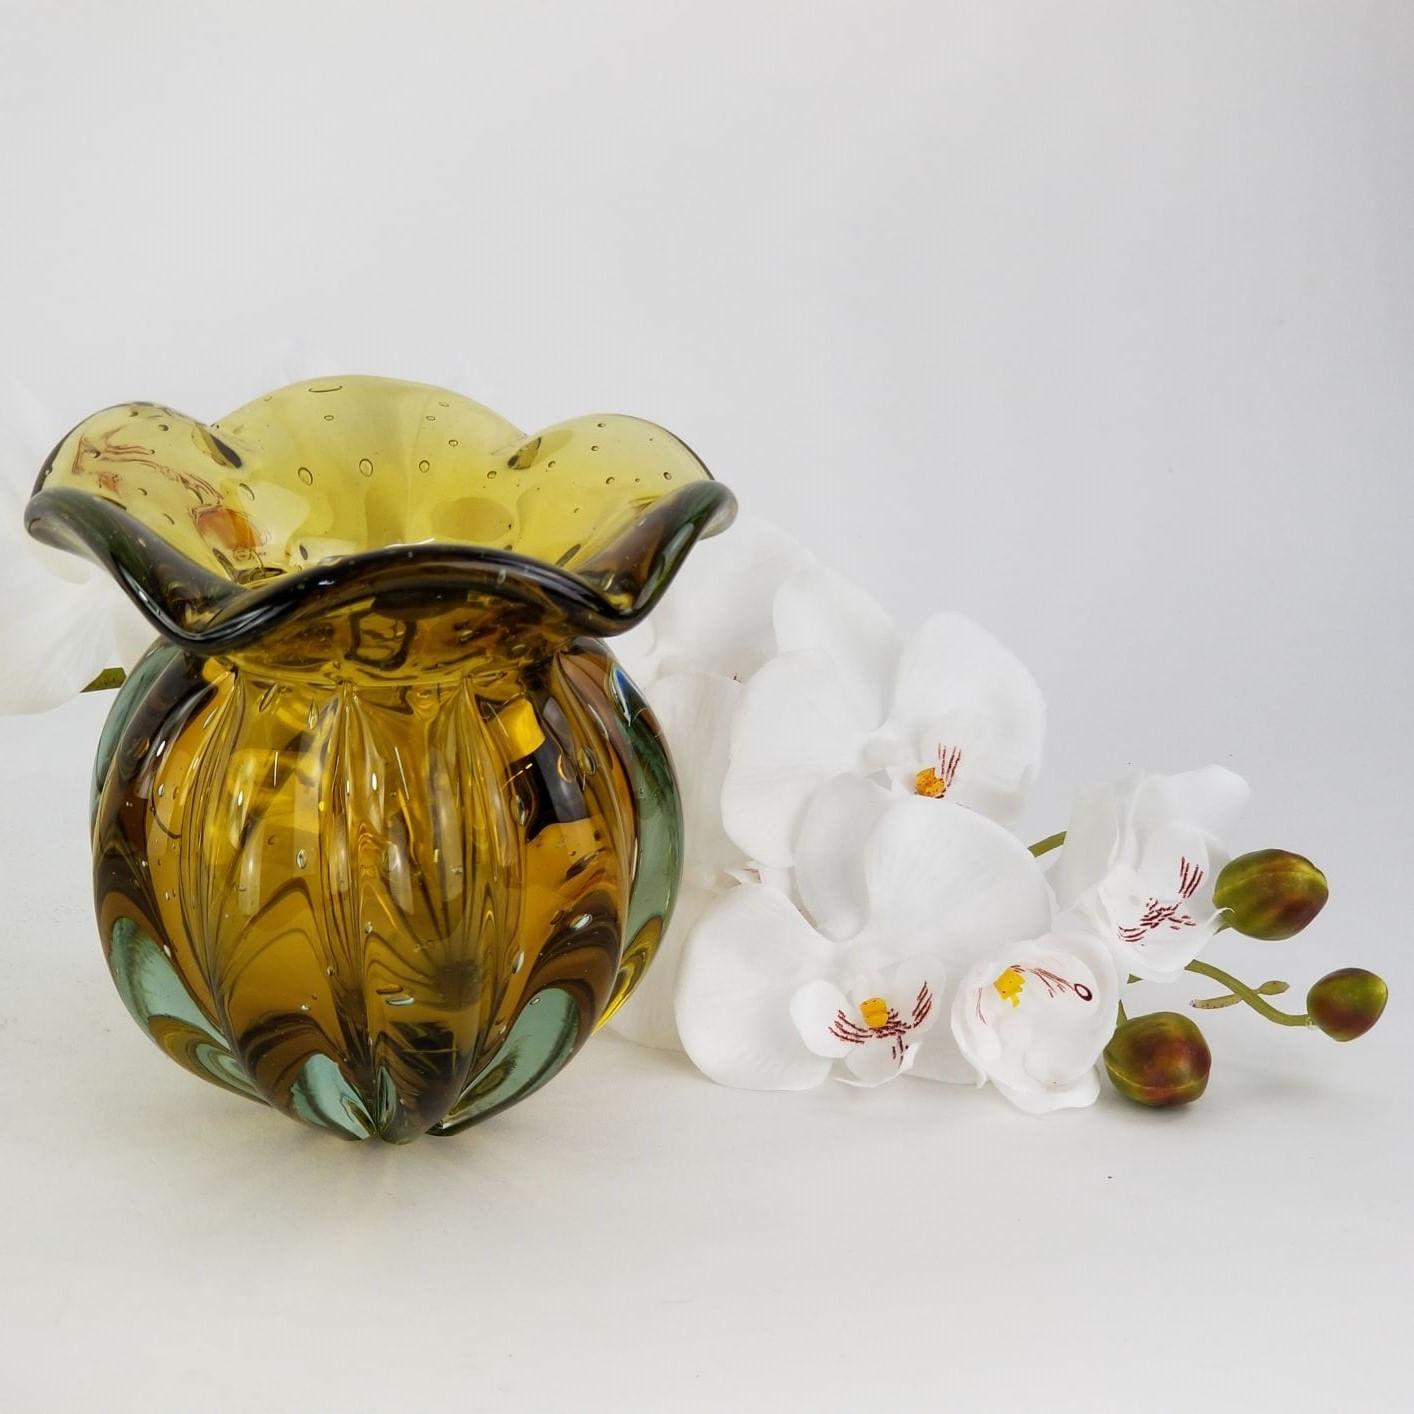 Trouxinha de Vidro Tipo Murano JR Glass - Pequena Cor Âmbar